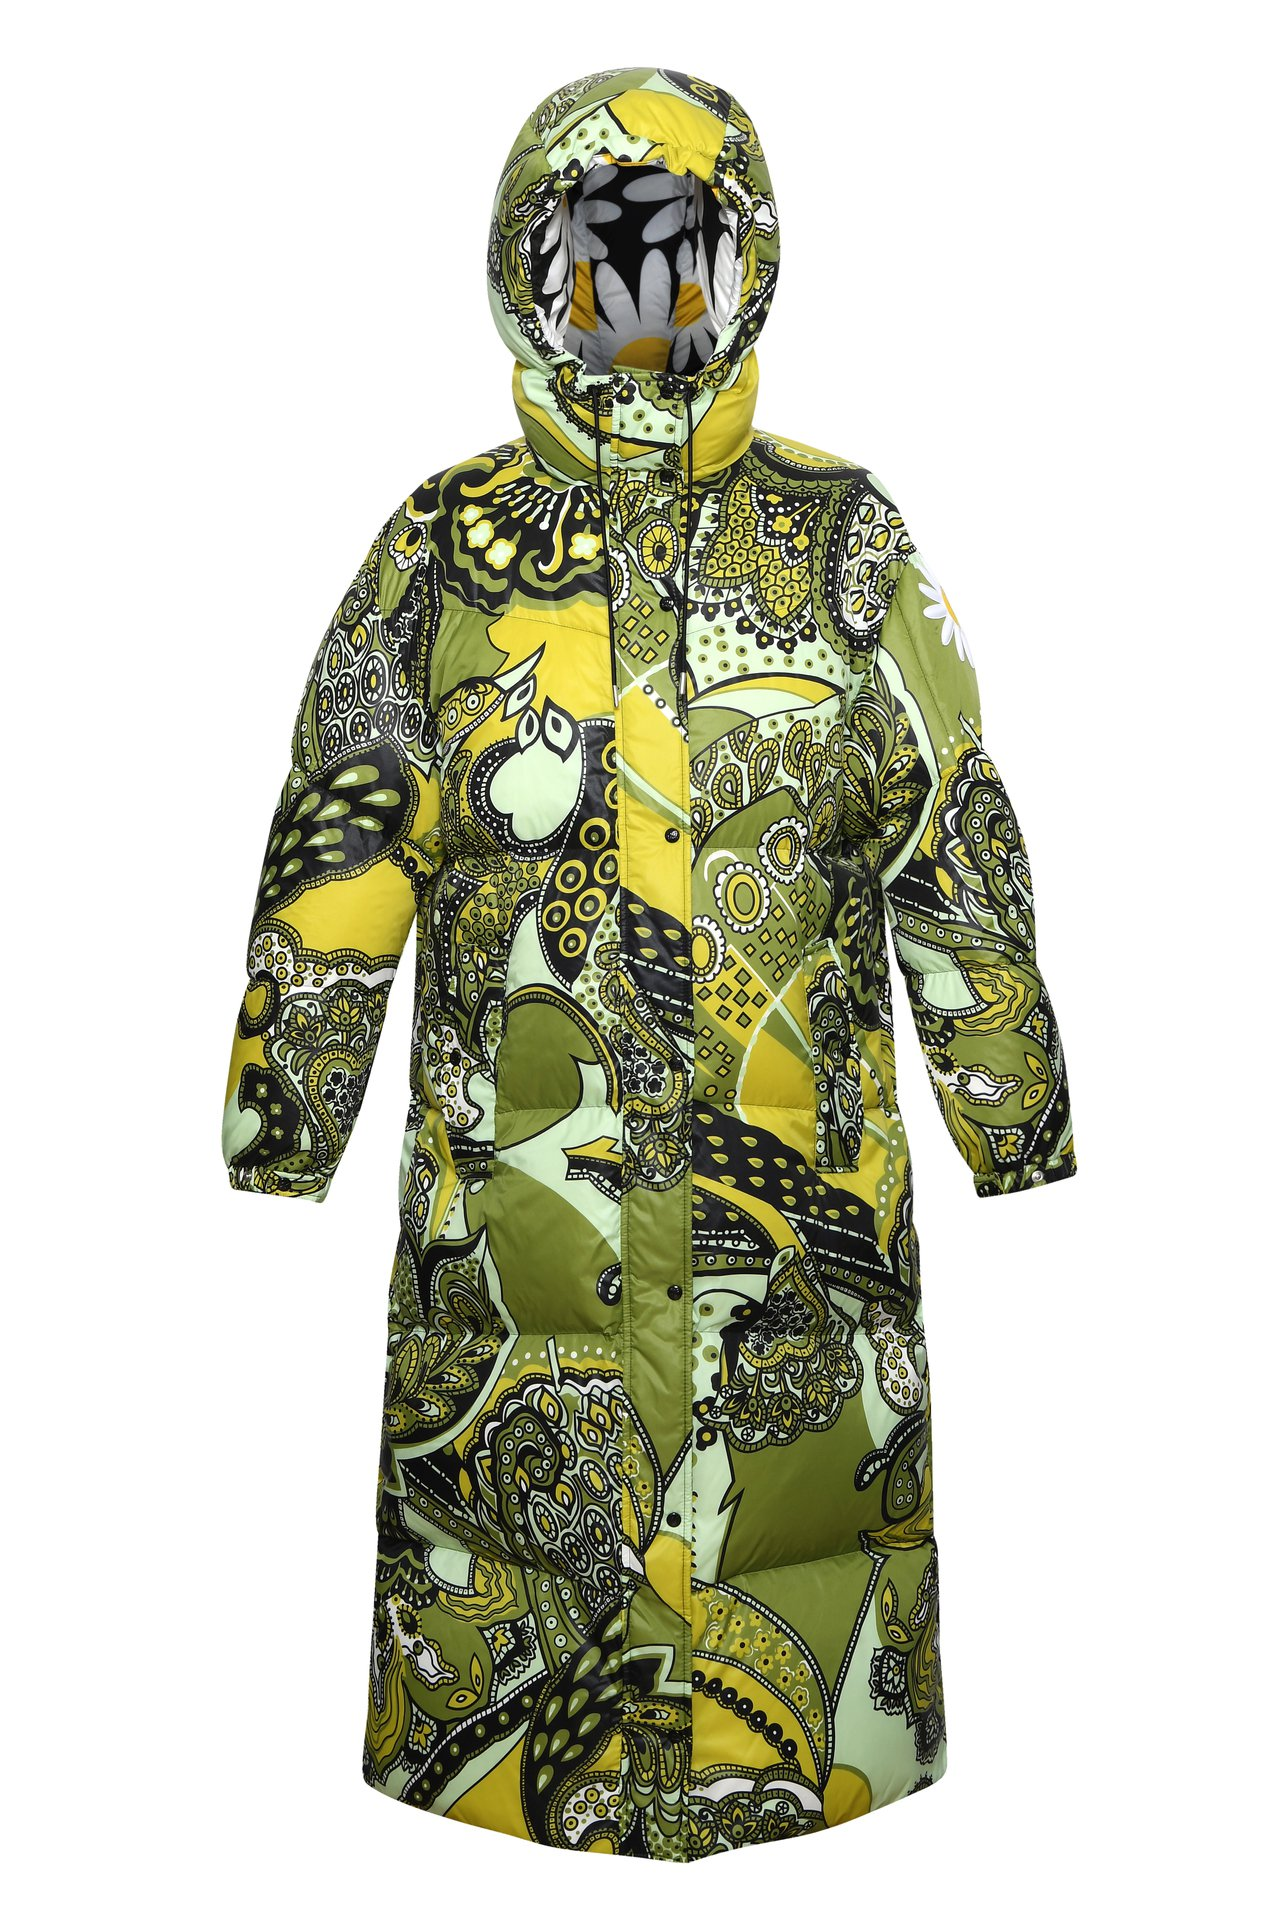 MONCLER Genius之中備受矚目的Richard Quinn羽絨外套。圖...